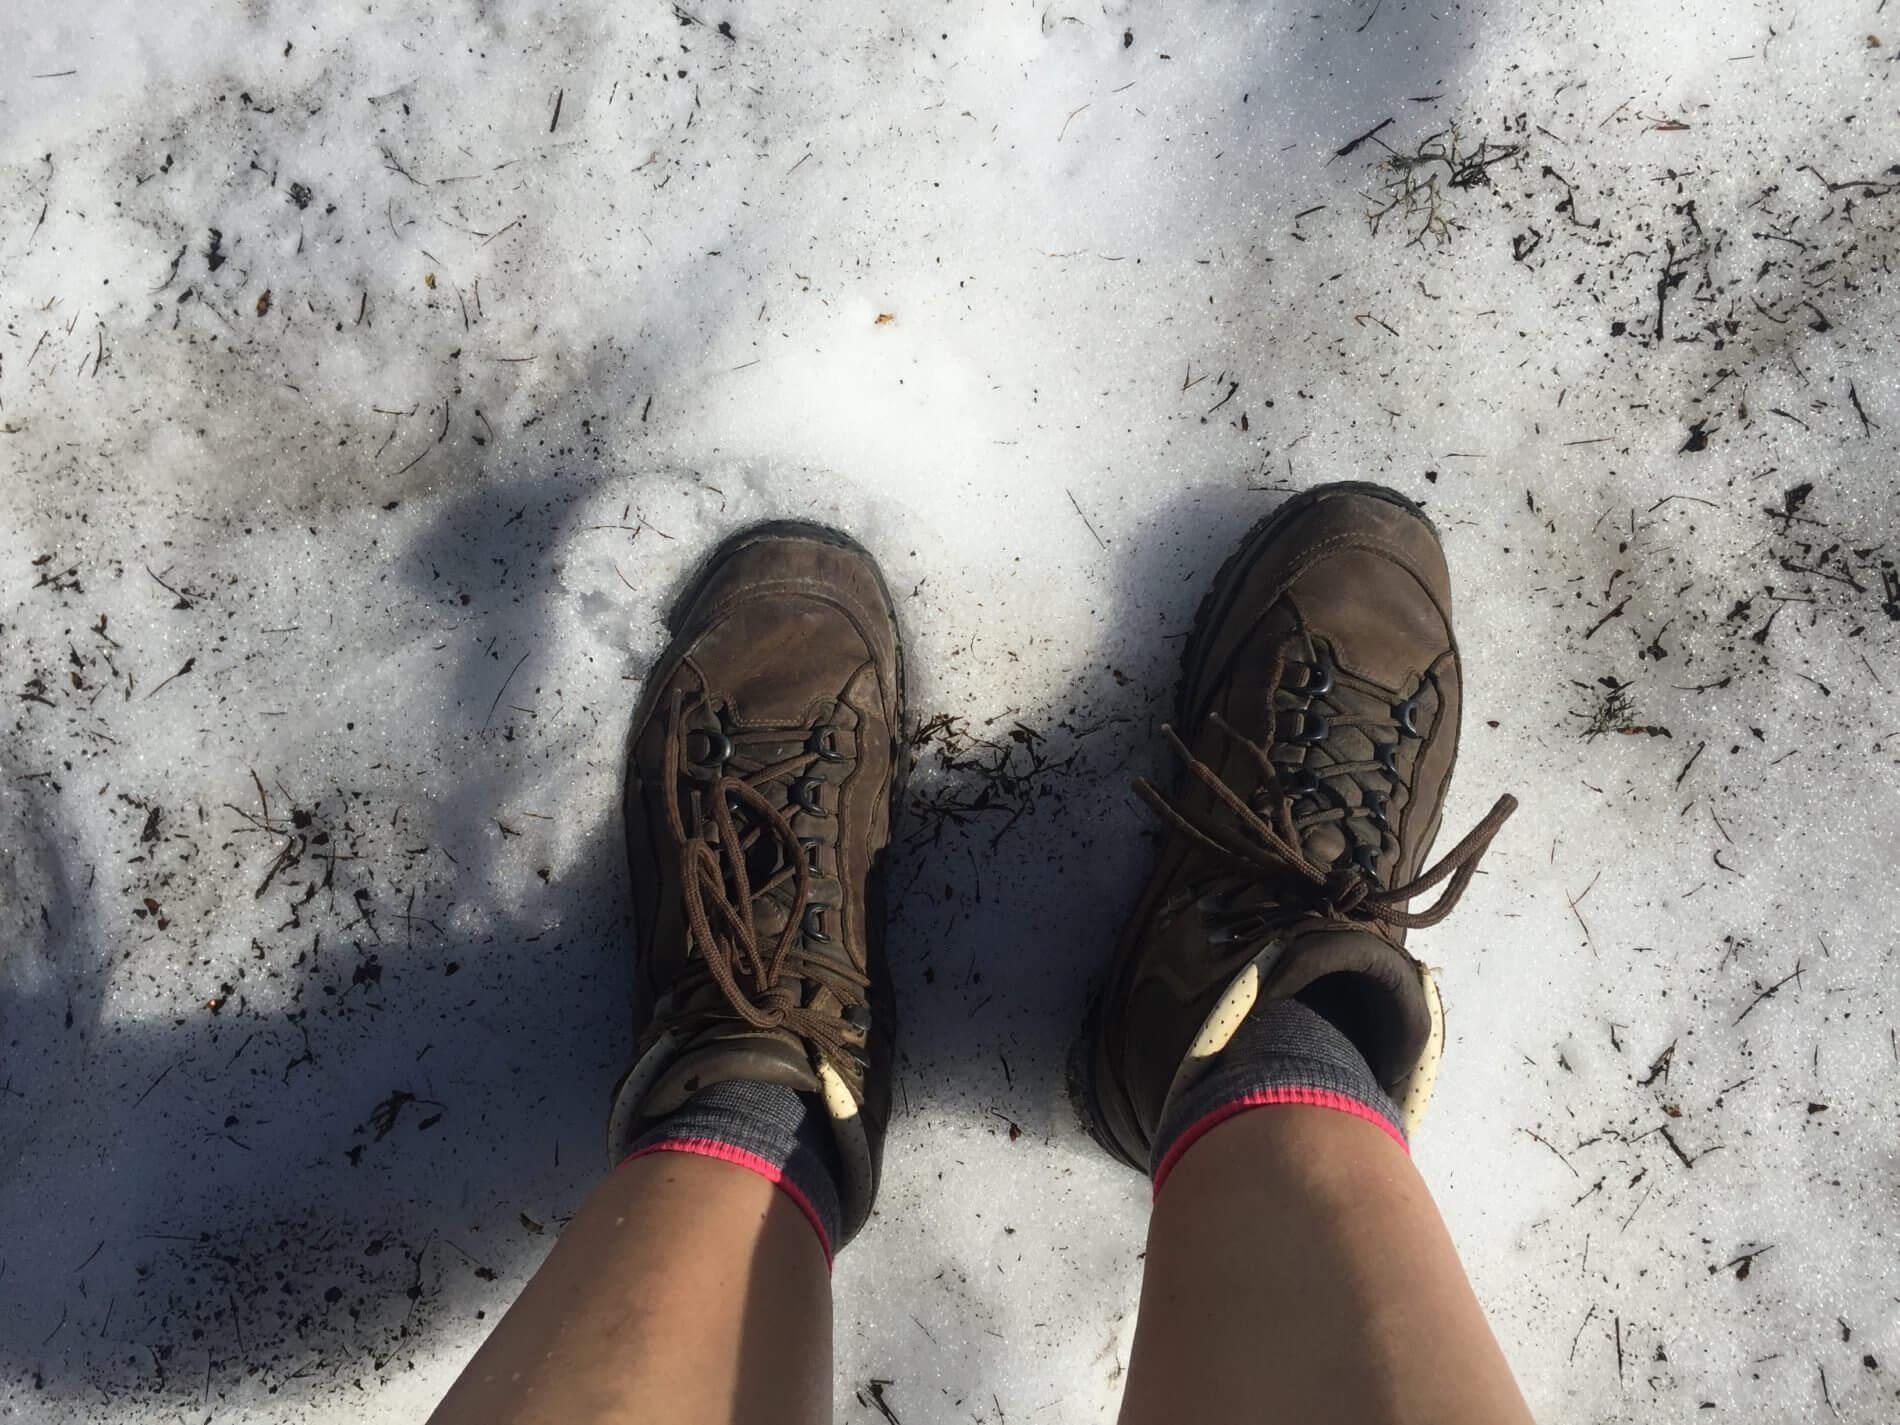 AAT_Alpe-Adria-Trail_Wegbeschaffenheit_Schnee